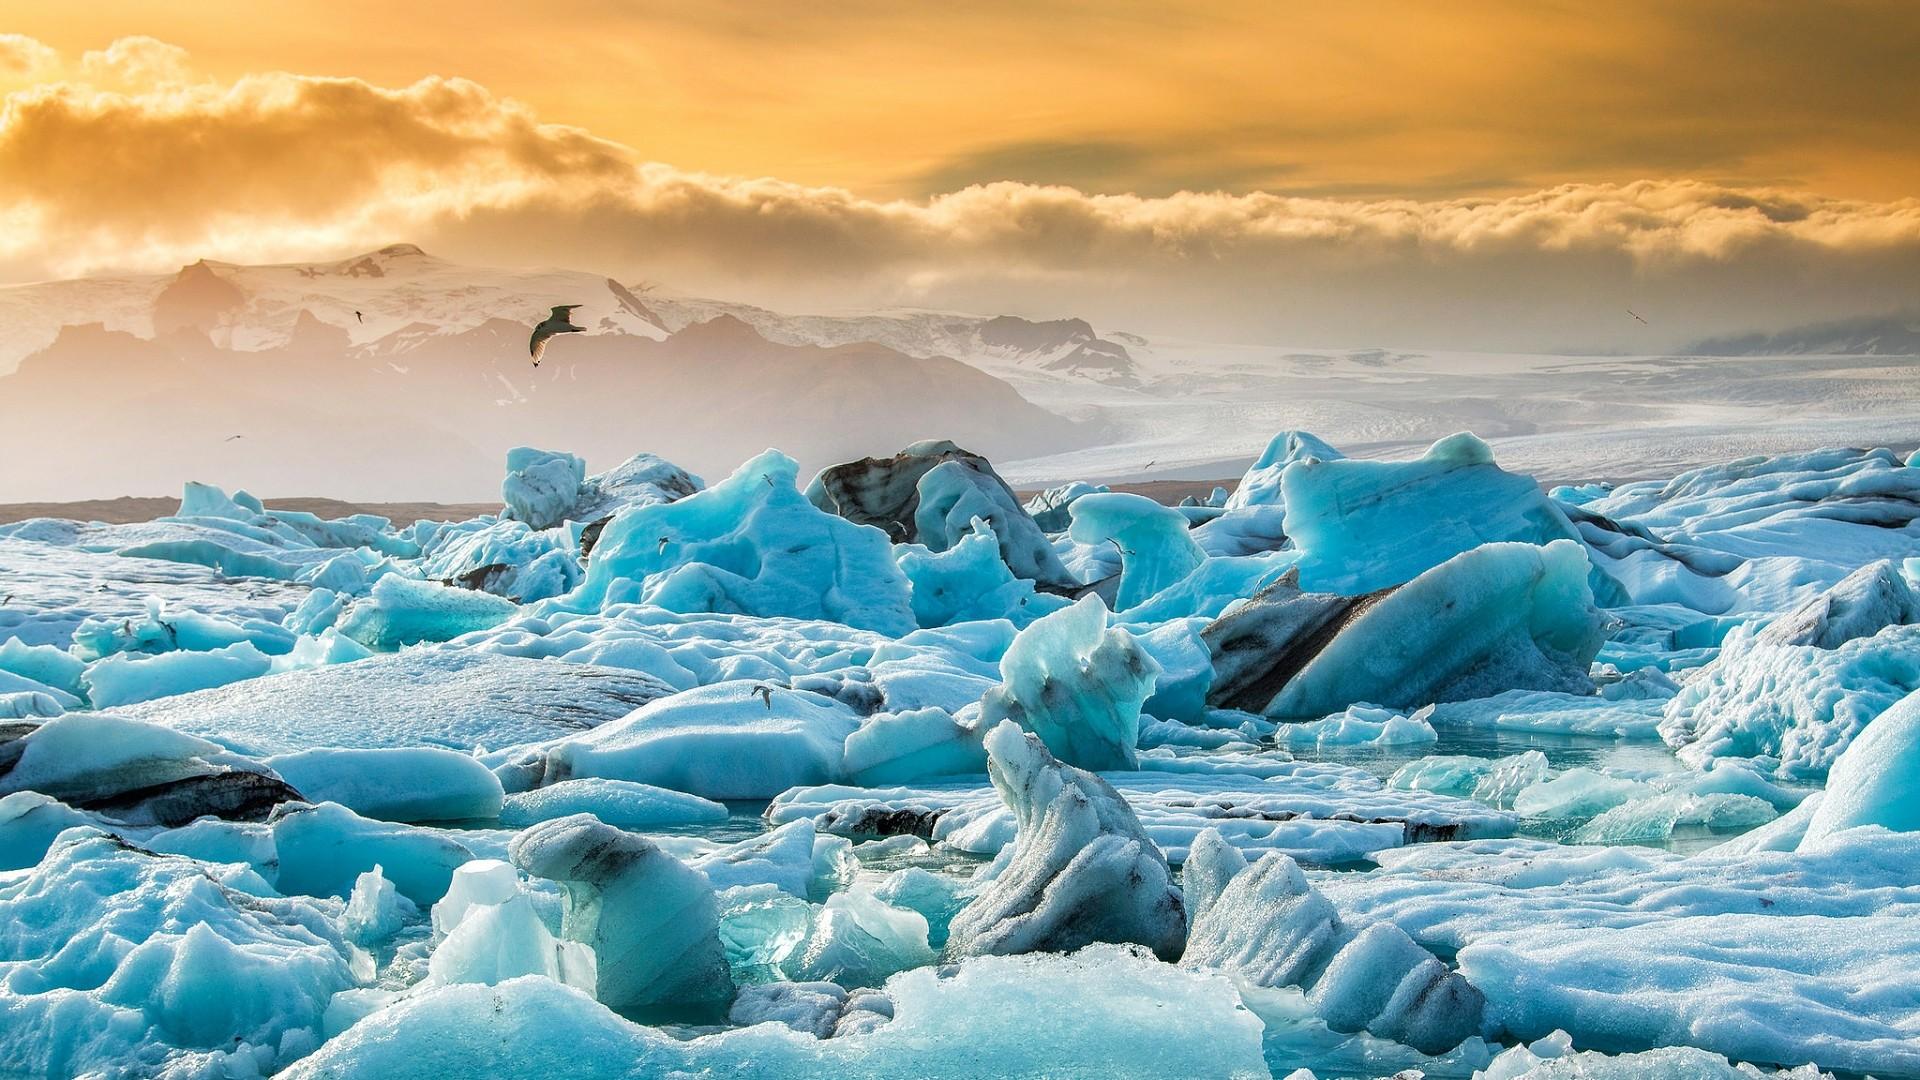 Preview wallpaper iceland jökulsárlón, glacier lagoon, ice floes, lake  1920×1080